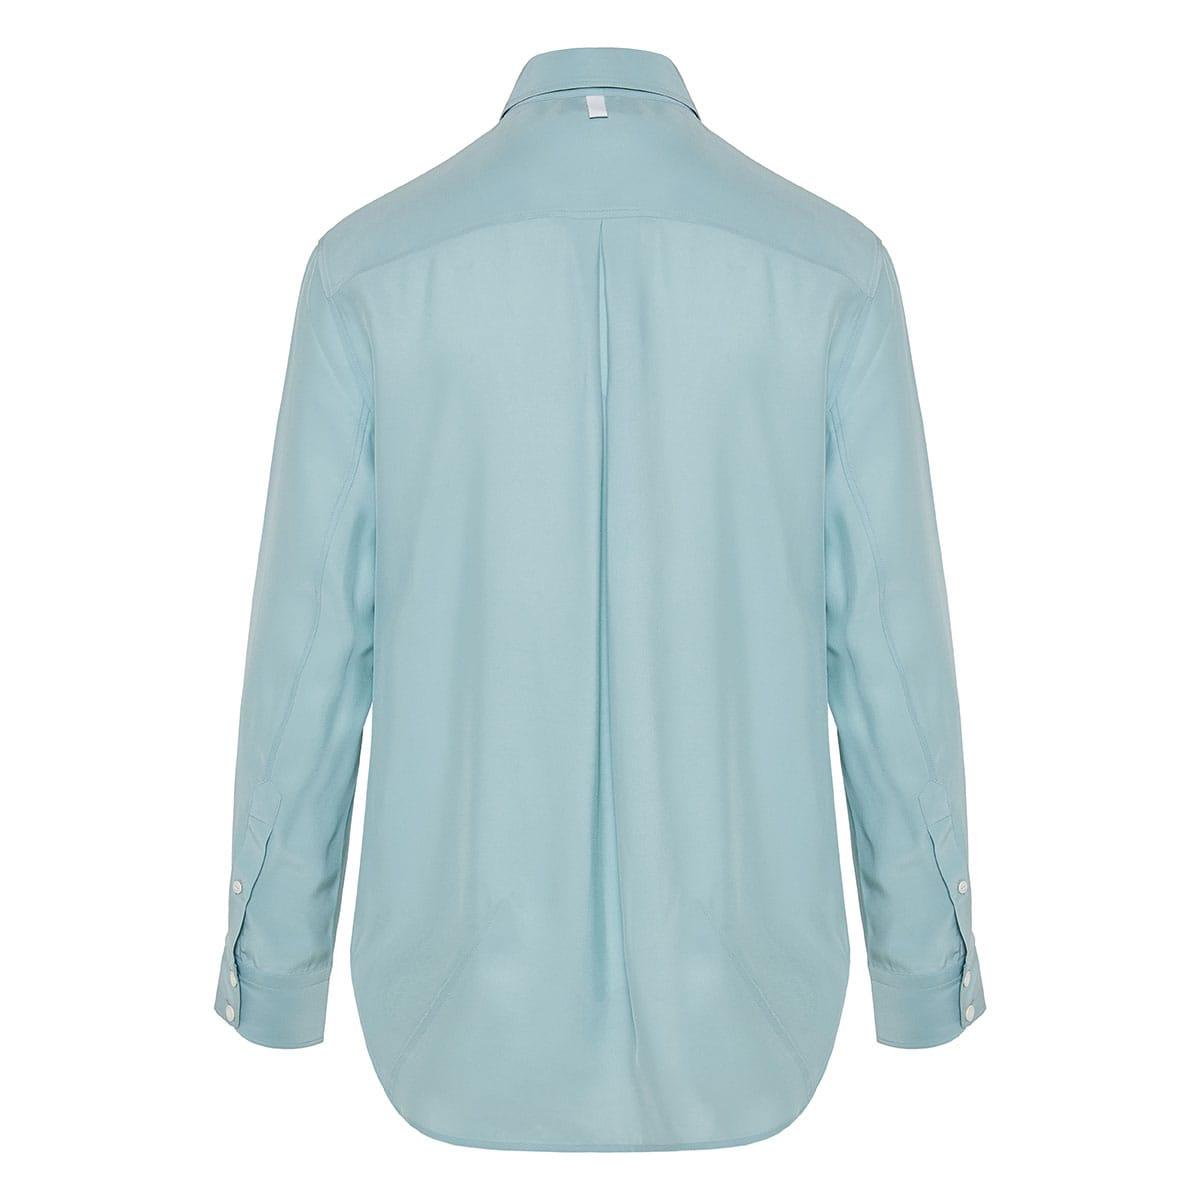 Anderson silk shirt